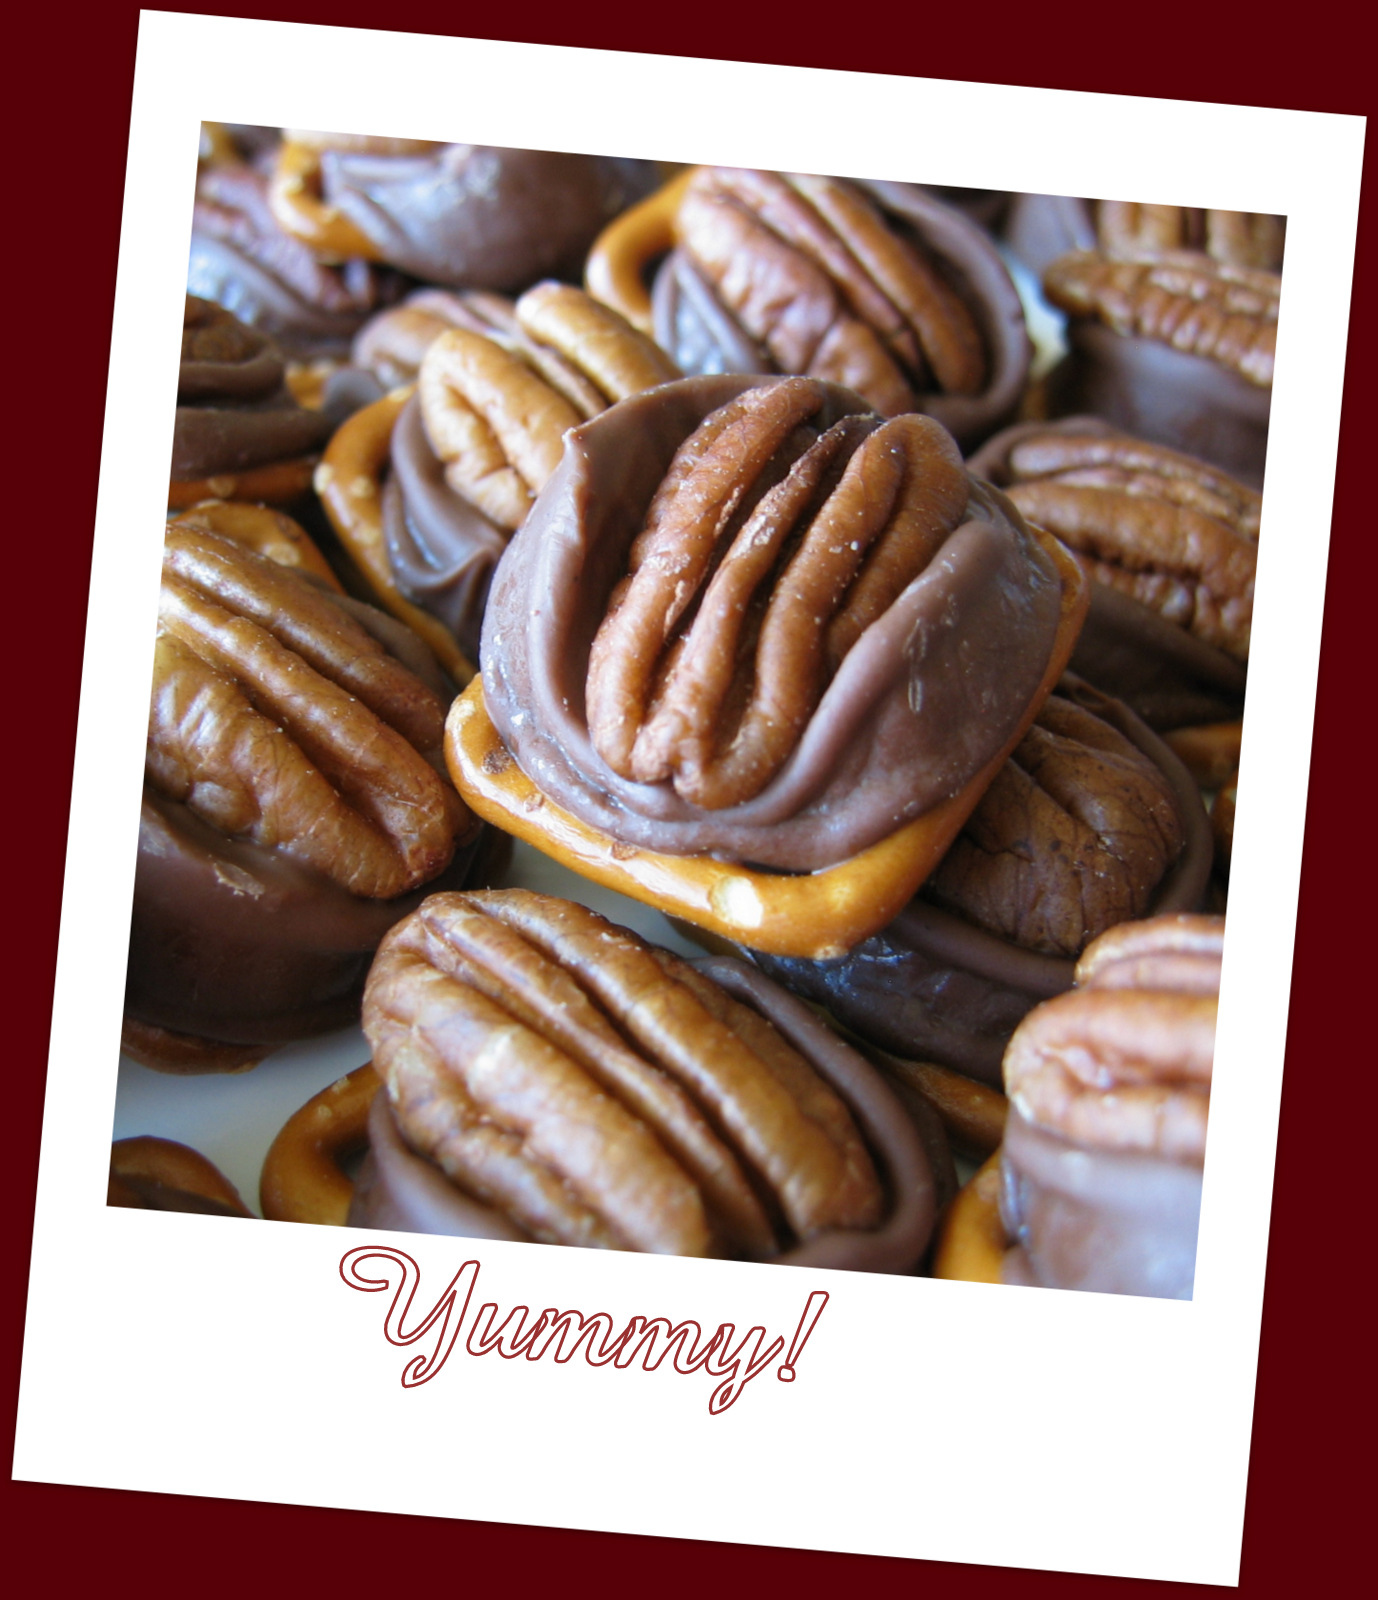 Pink Cookies with Sprinkles: Treats as easy as 1...2...3!